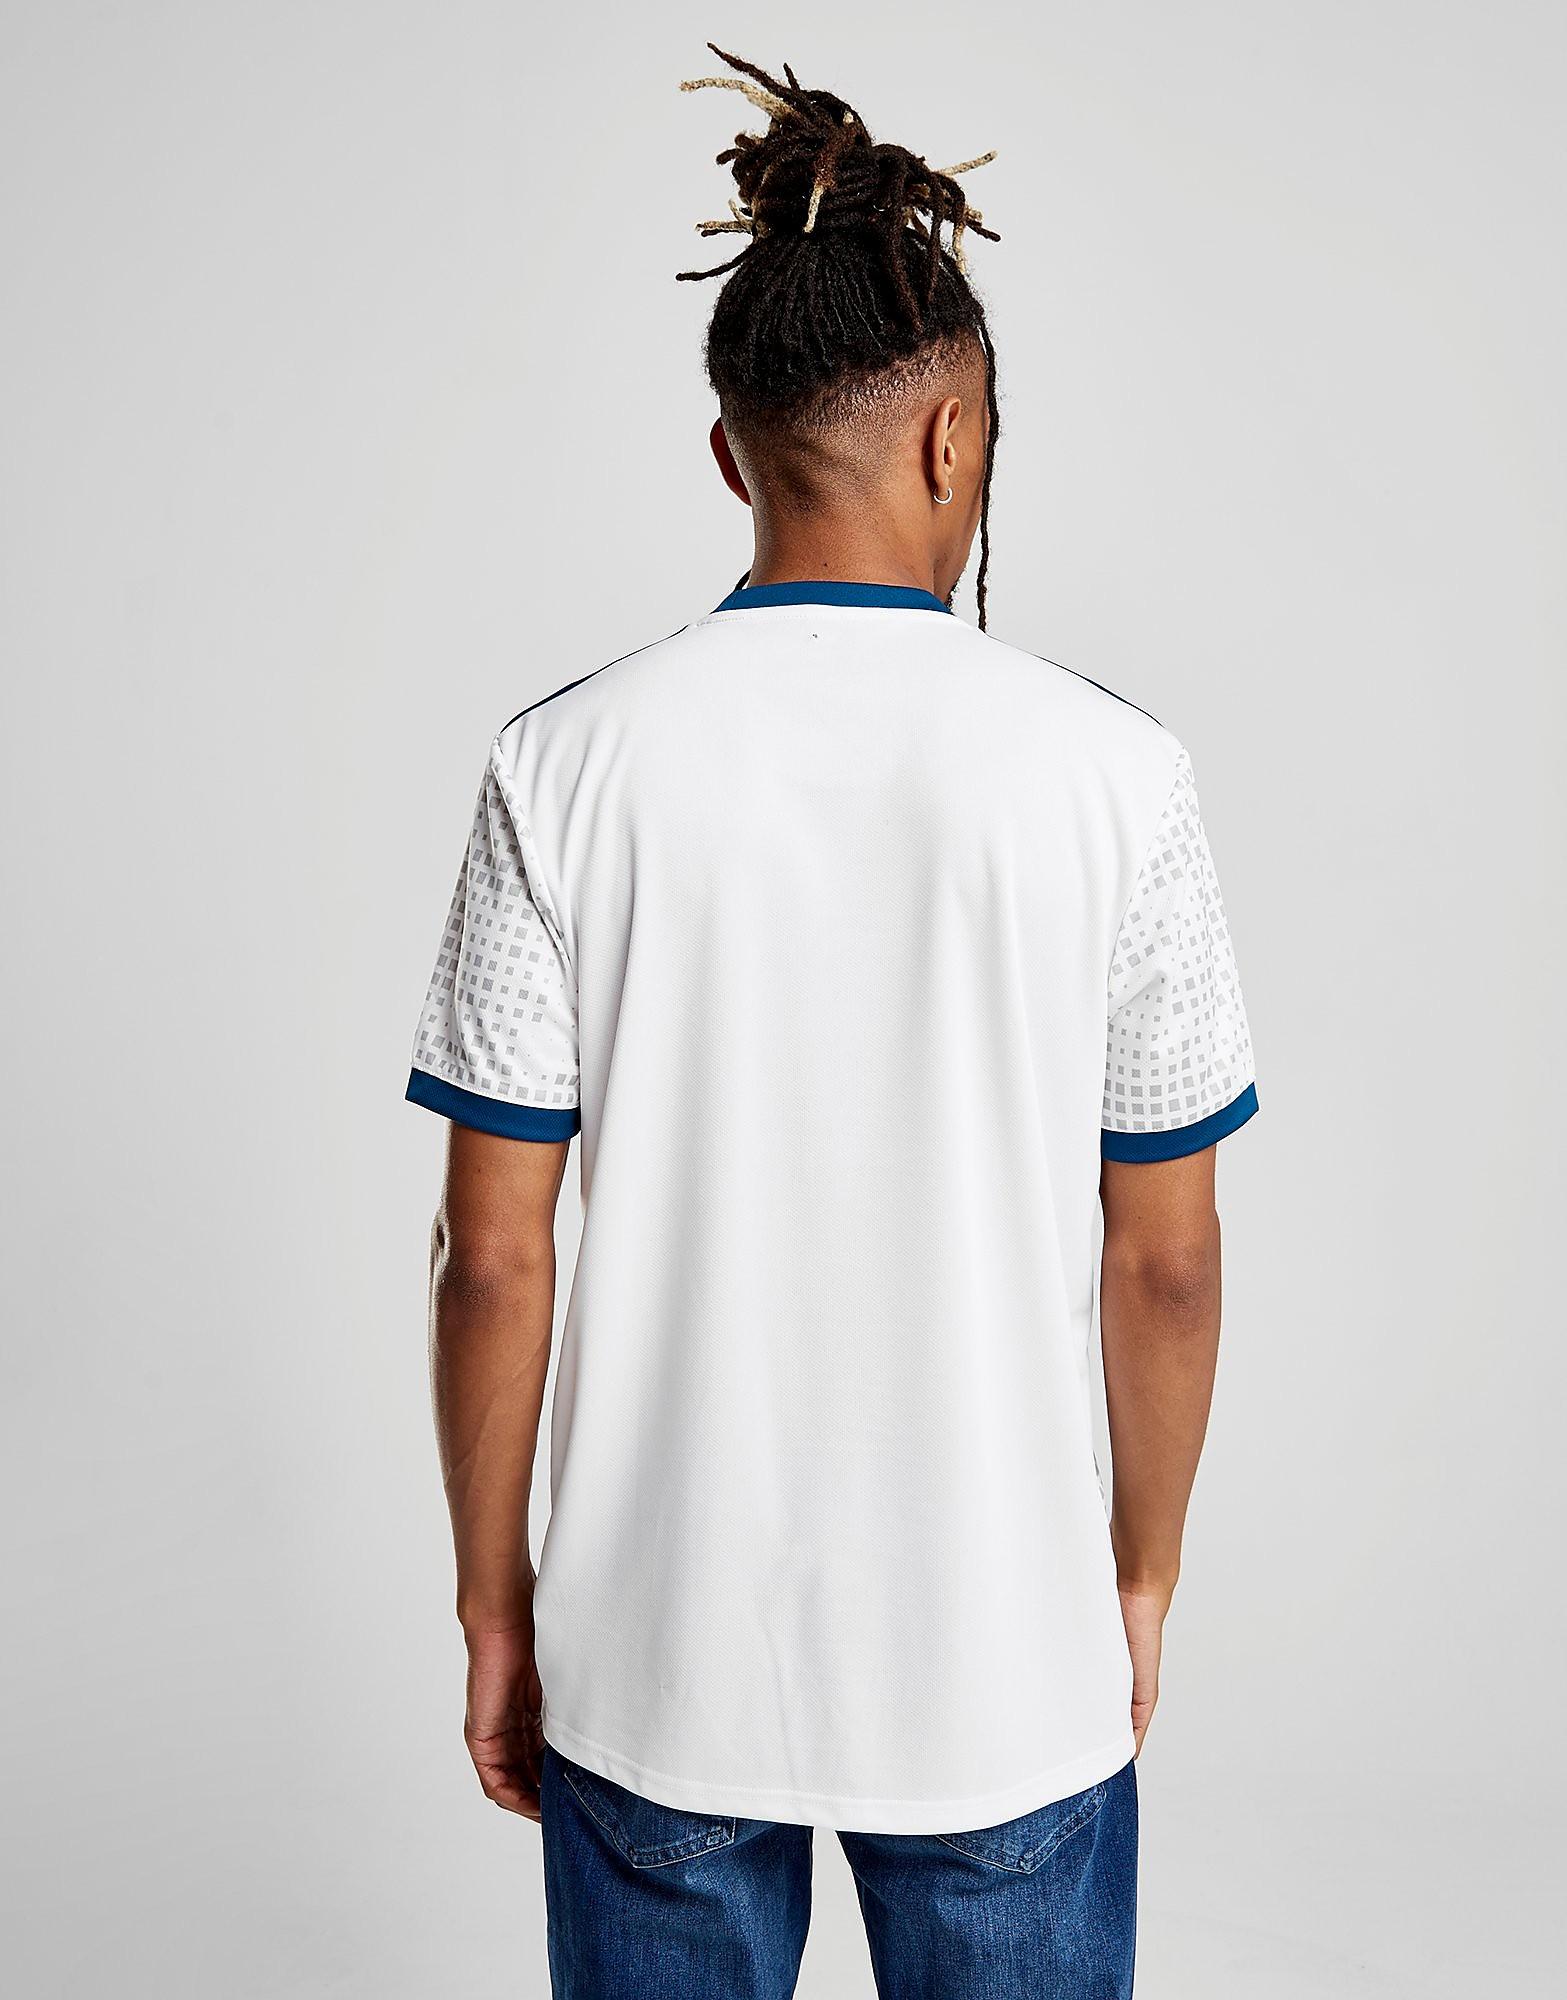 adidas Russia 2018 Away Shirt